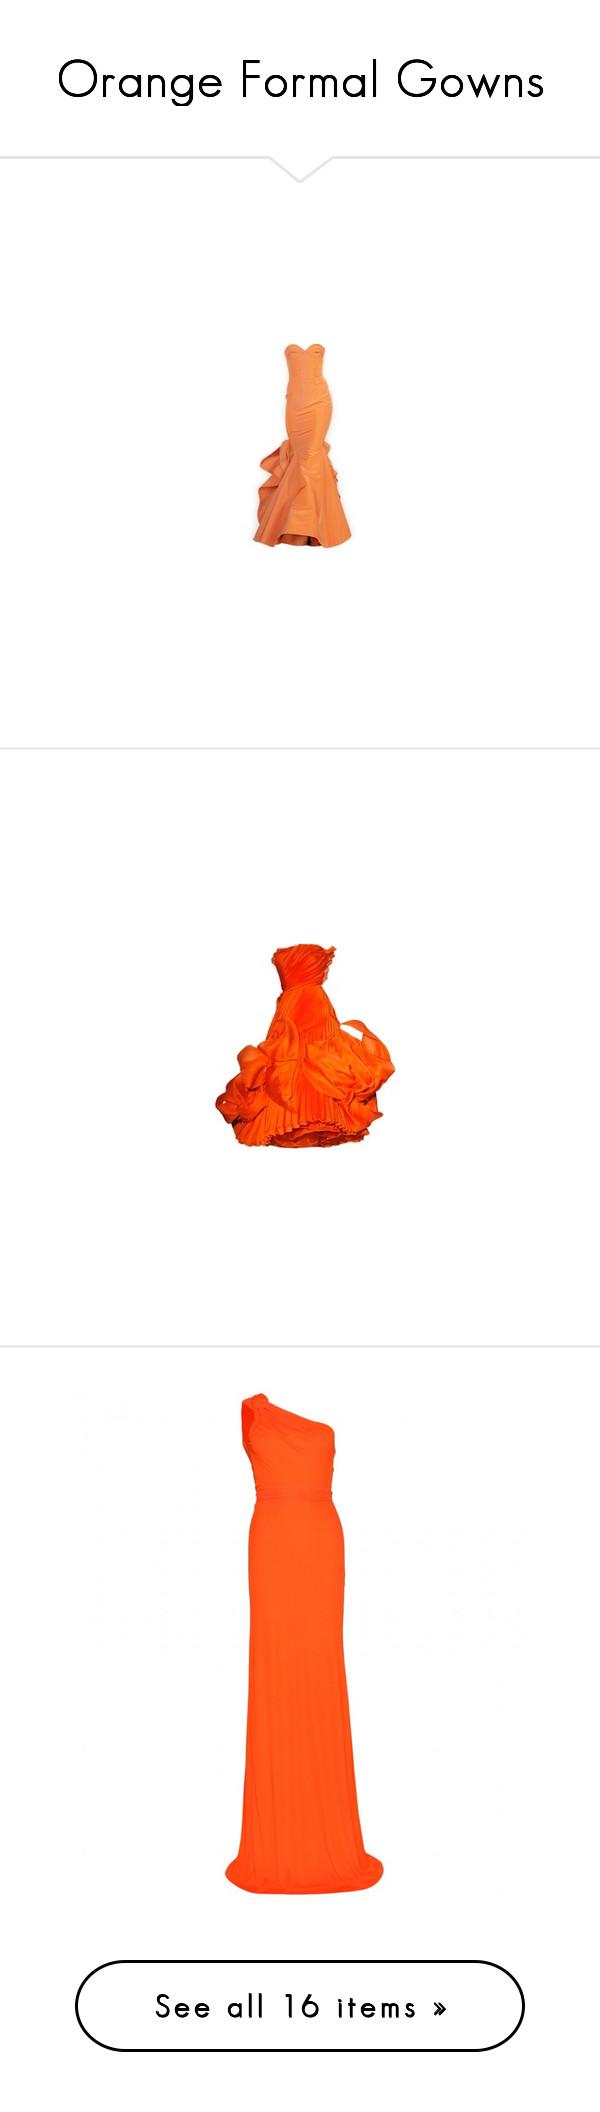 Orange Formal Gowns\